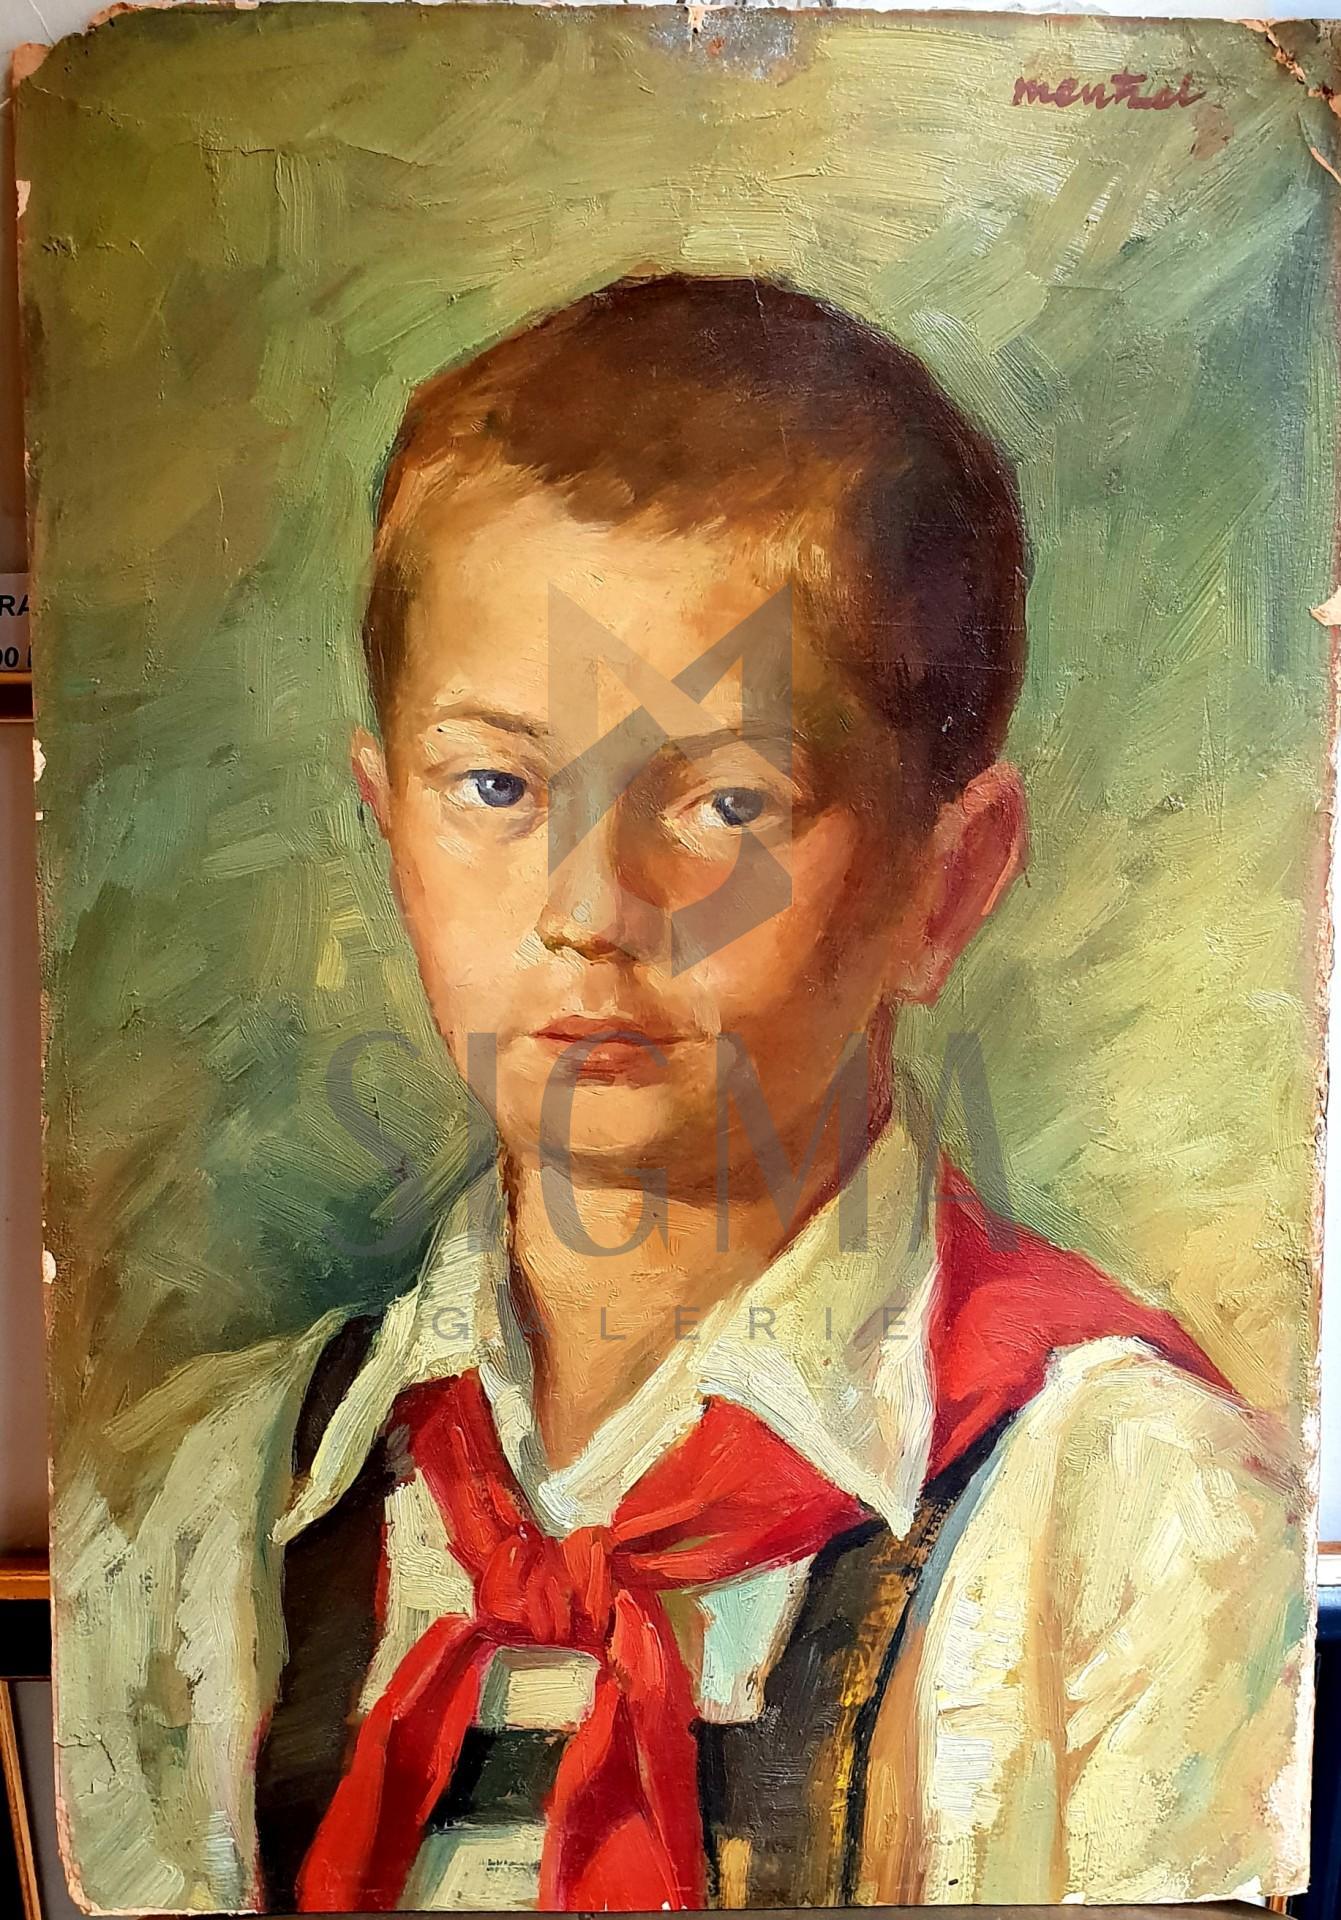 Tablou, Avram Mentzel, - Pionier -, ulei pe carton, 41,5x28,5 cm